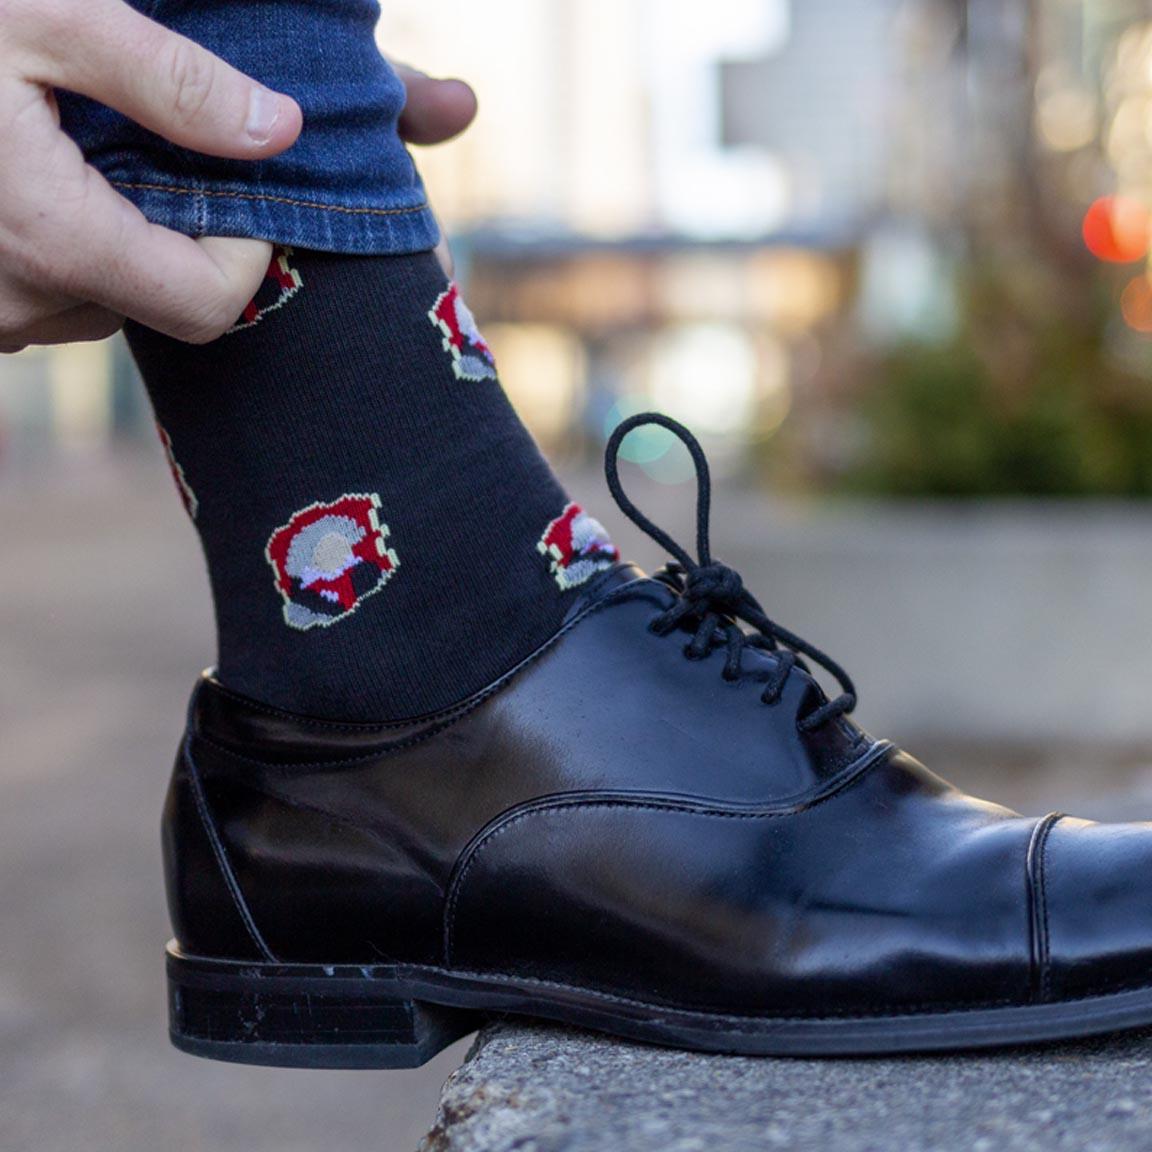 Beethoven Socks